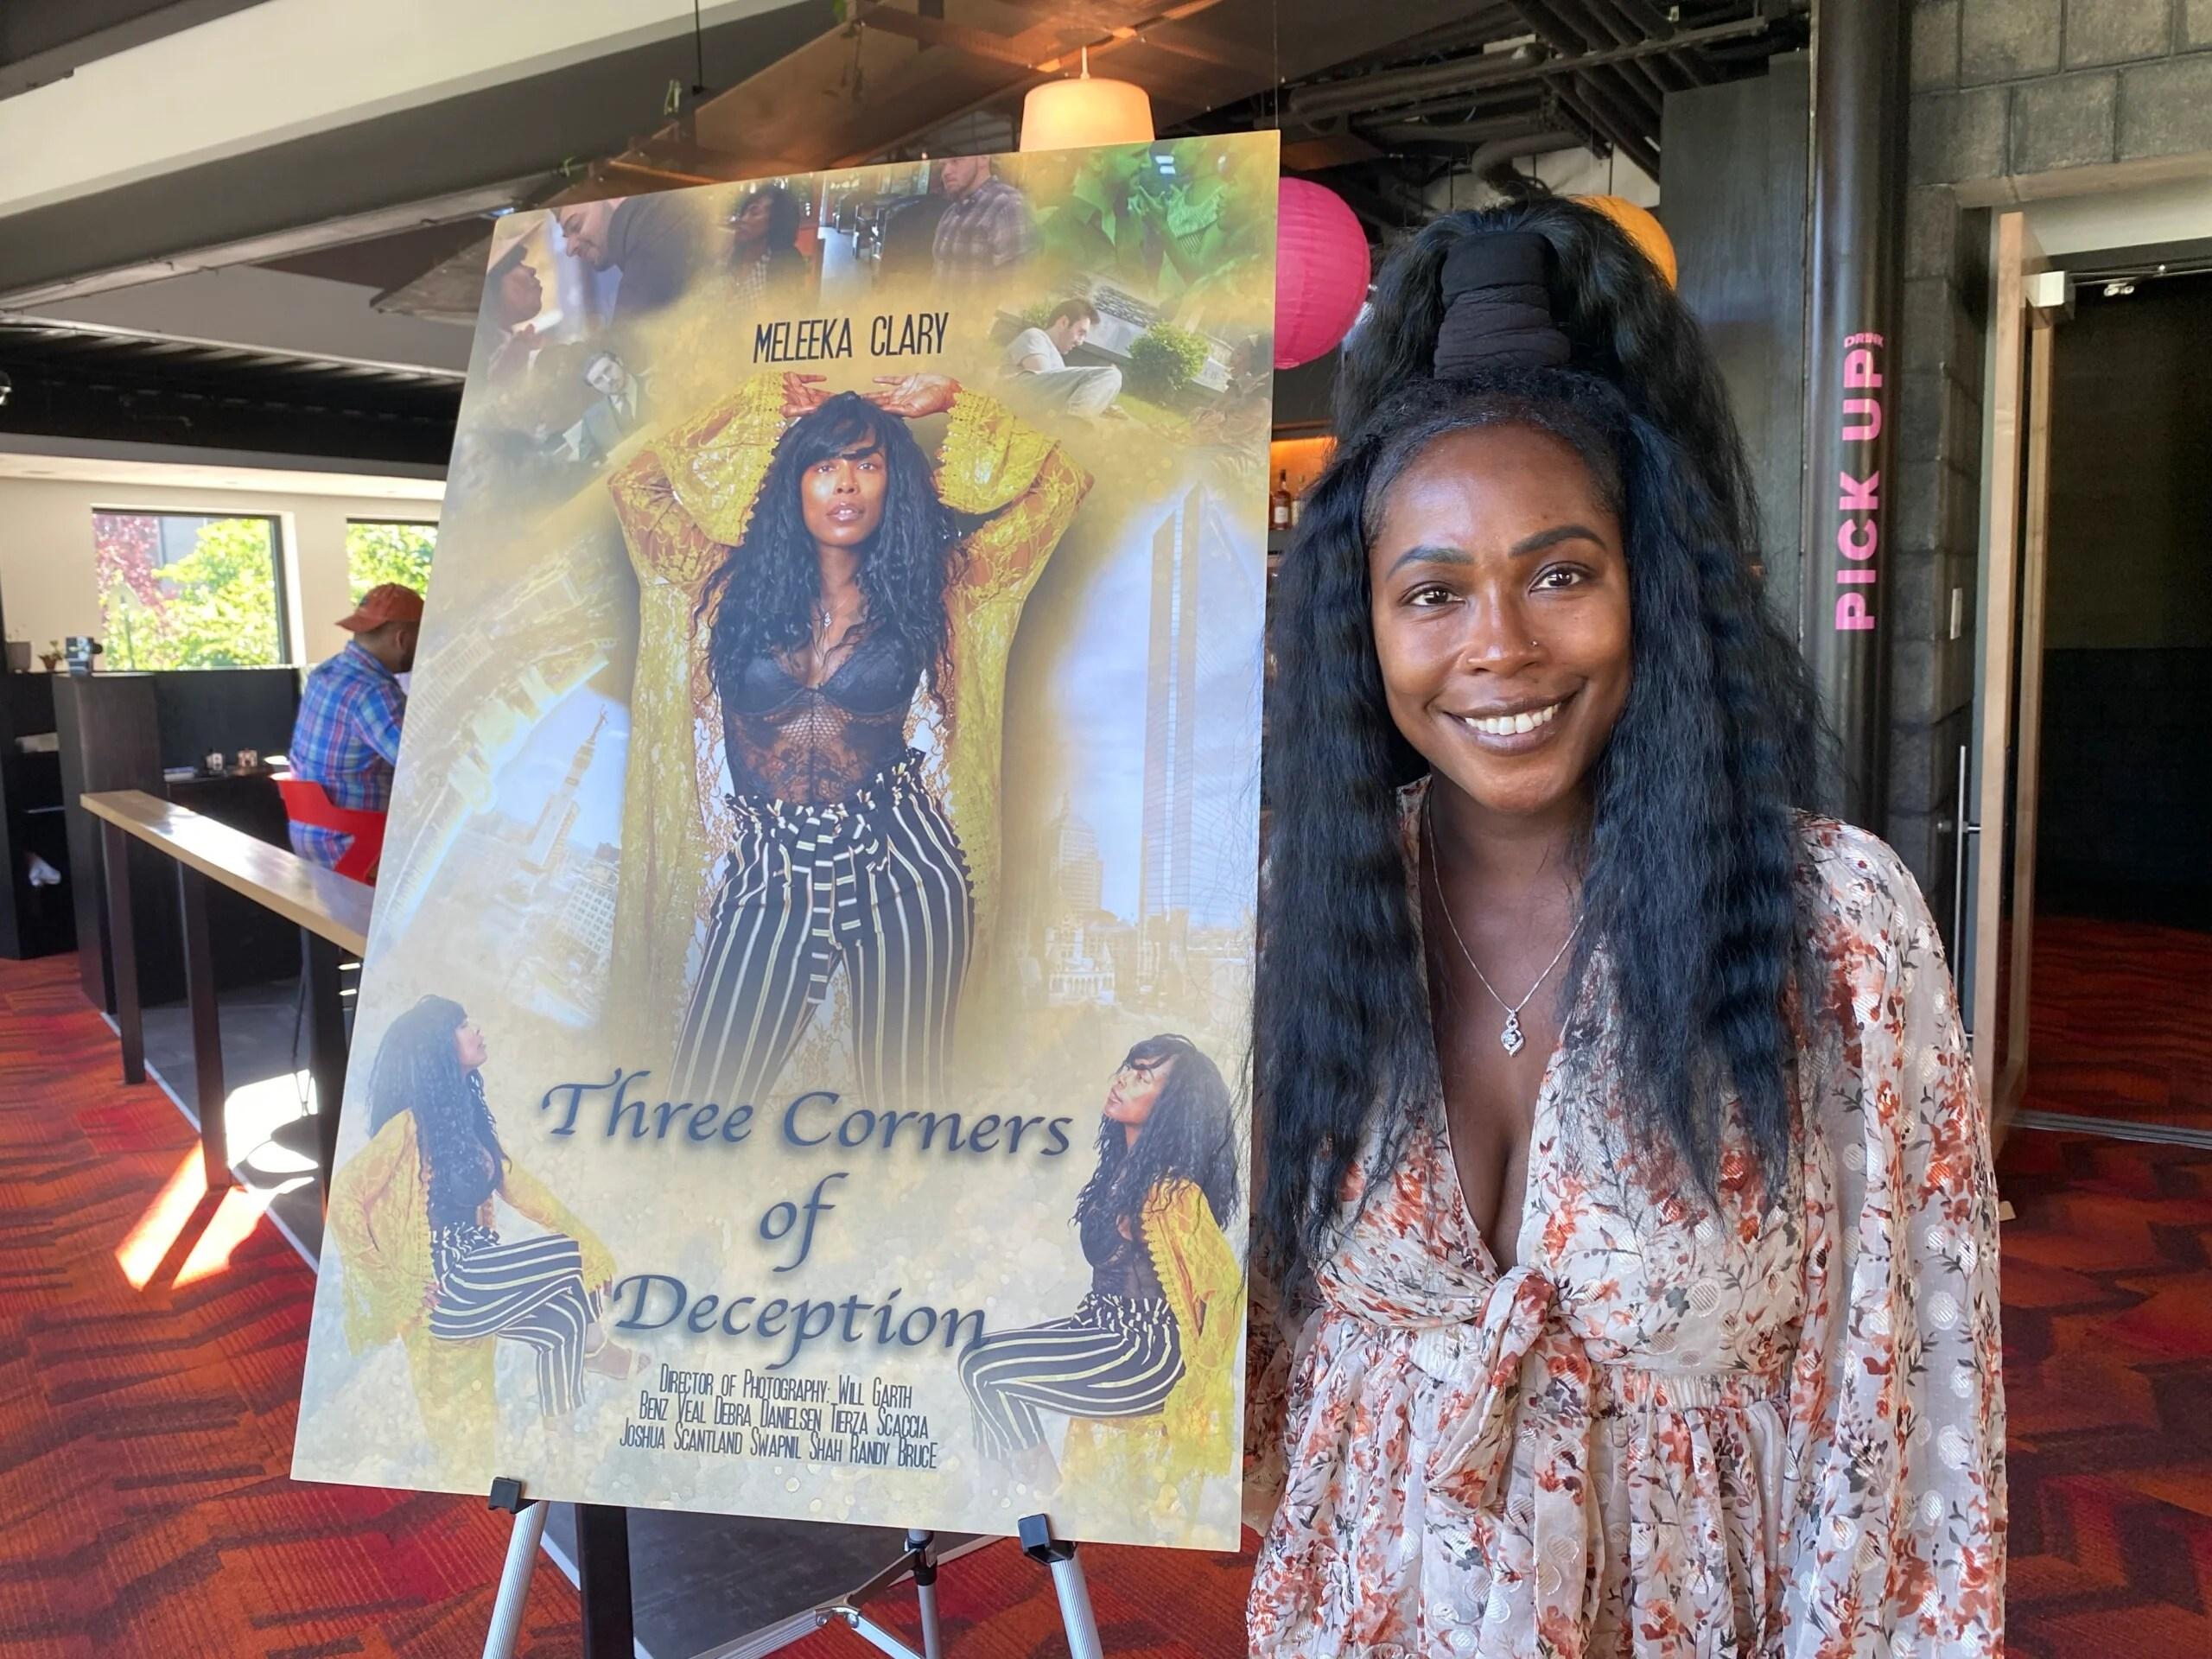 New Kan-Kan Cinema showcasing Indianapolis film talent